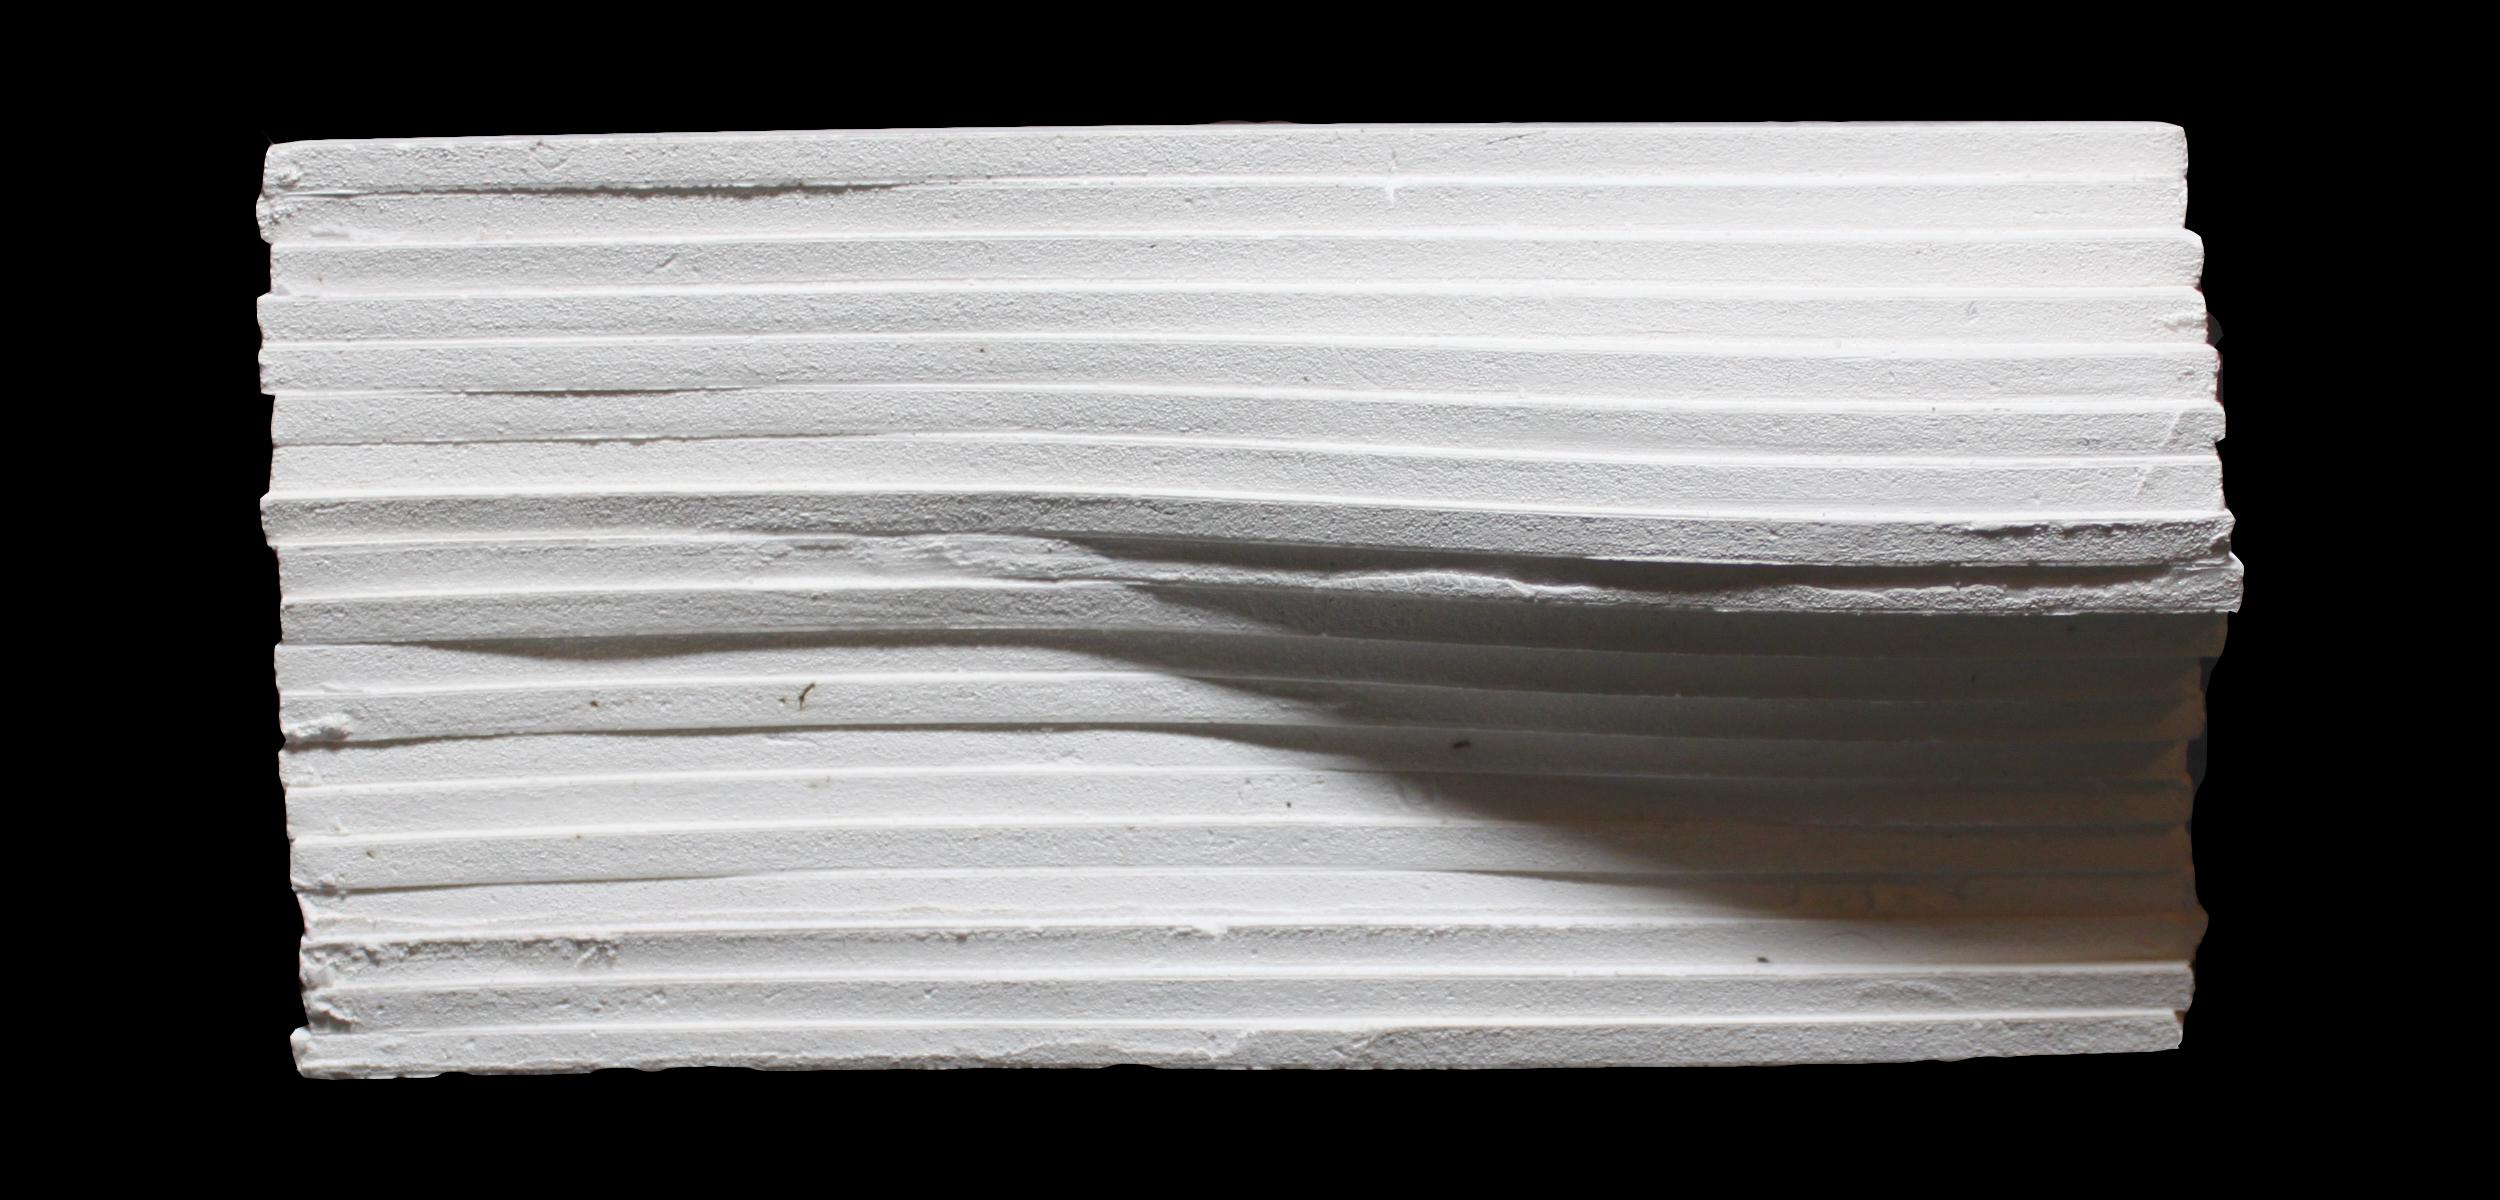 15F*405*ALEXA*NEWCO*ADRIA*MONJA*YANEL*MASCA*ARIEL*Plaster Mockup Model 1.jpg